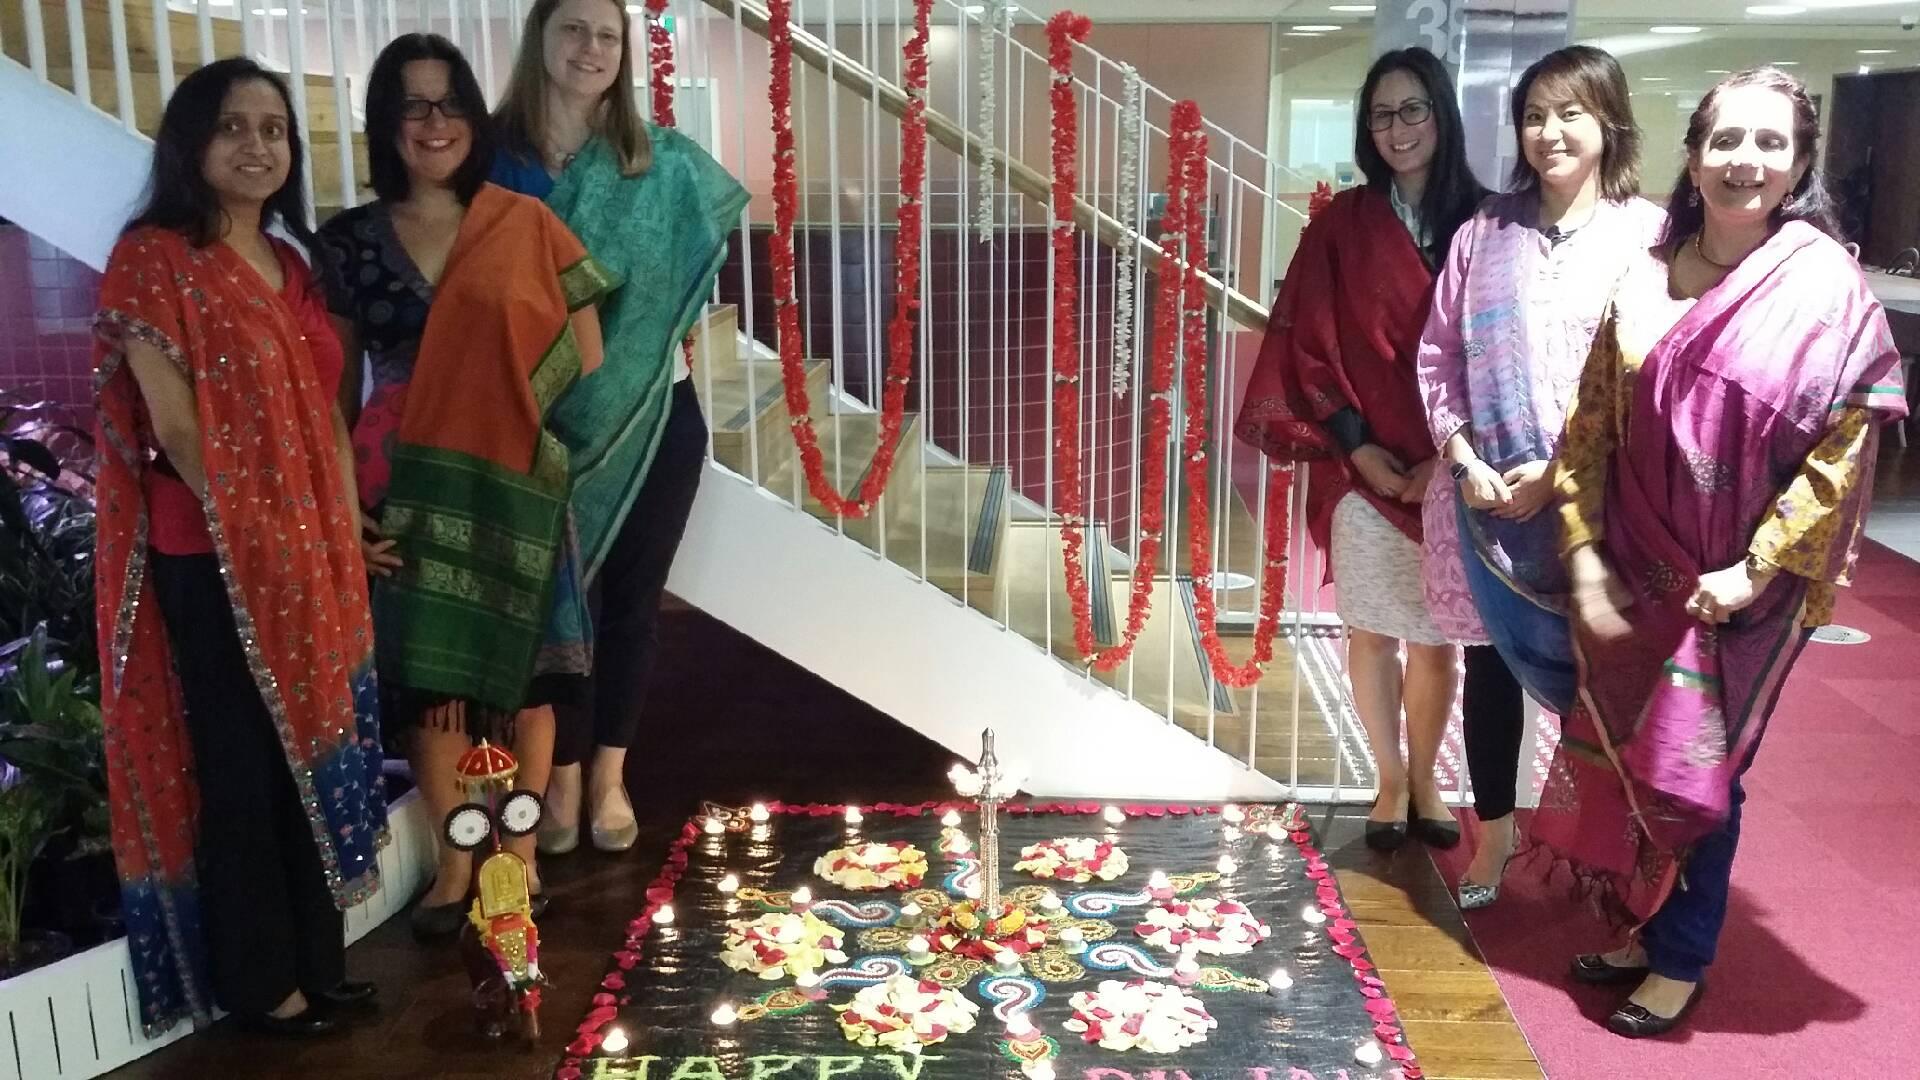 Team Firework -Lakshmi Sreedhar; Loi Truong, Nicole Howe, Sheevali Goradia, Tarin Hillier, Rachelle Greenshields, Michelle Hasler, Belinda Kolar